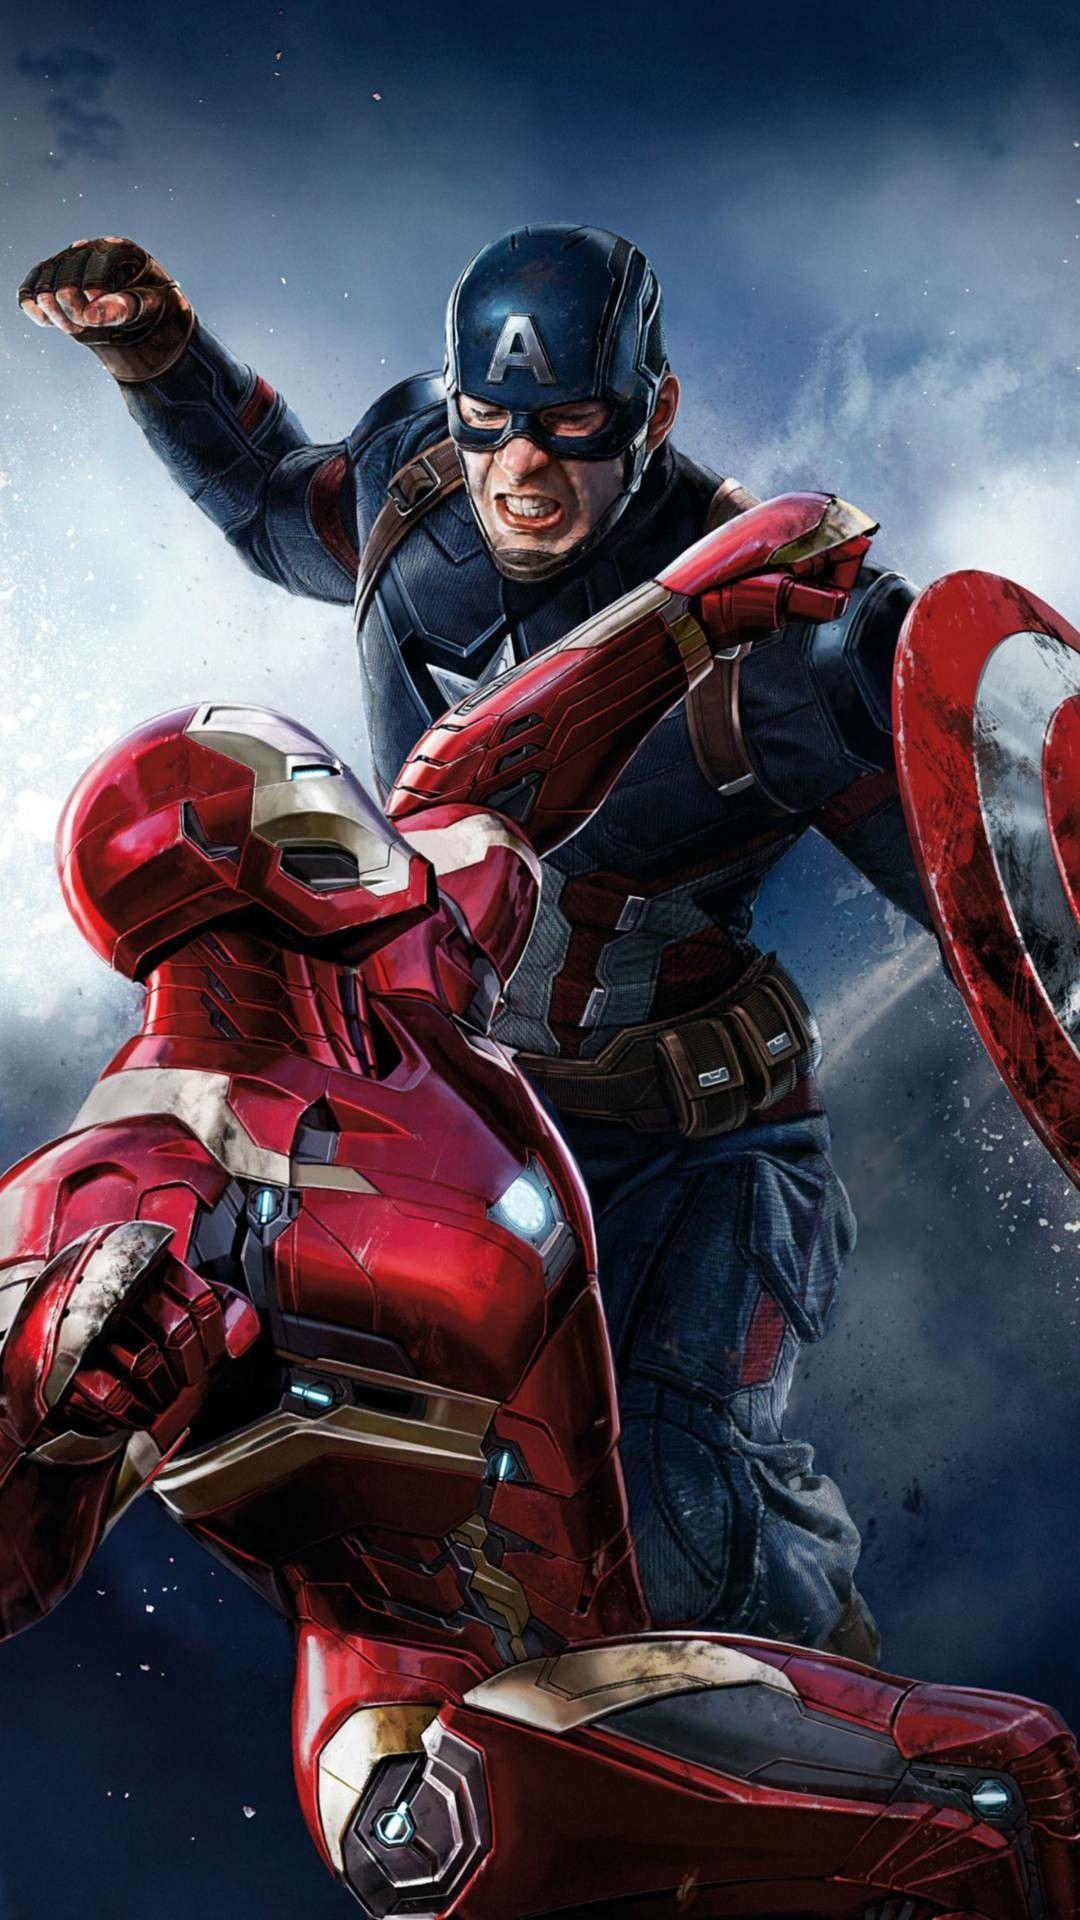 Popular Wallpaper Movie Captain America Civil War - 426b384b1cbb9f60842f681a179bcf5a  Snapshot_69947.jpg